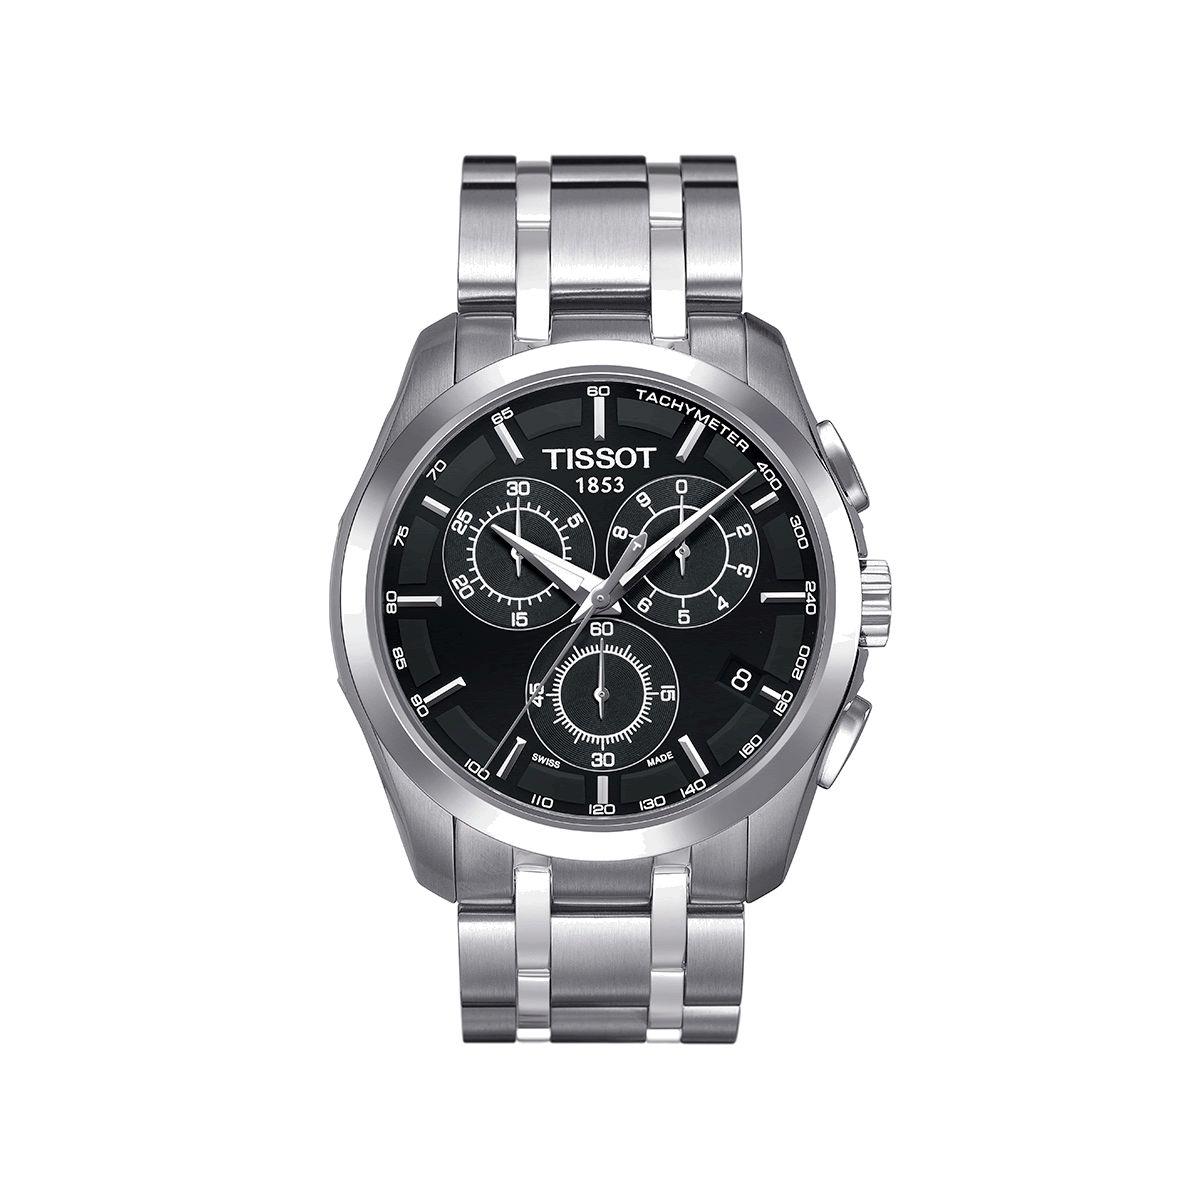 c270aaed62f Tissot Watches - Macy s